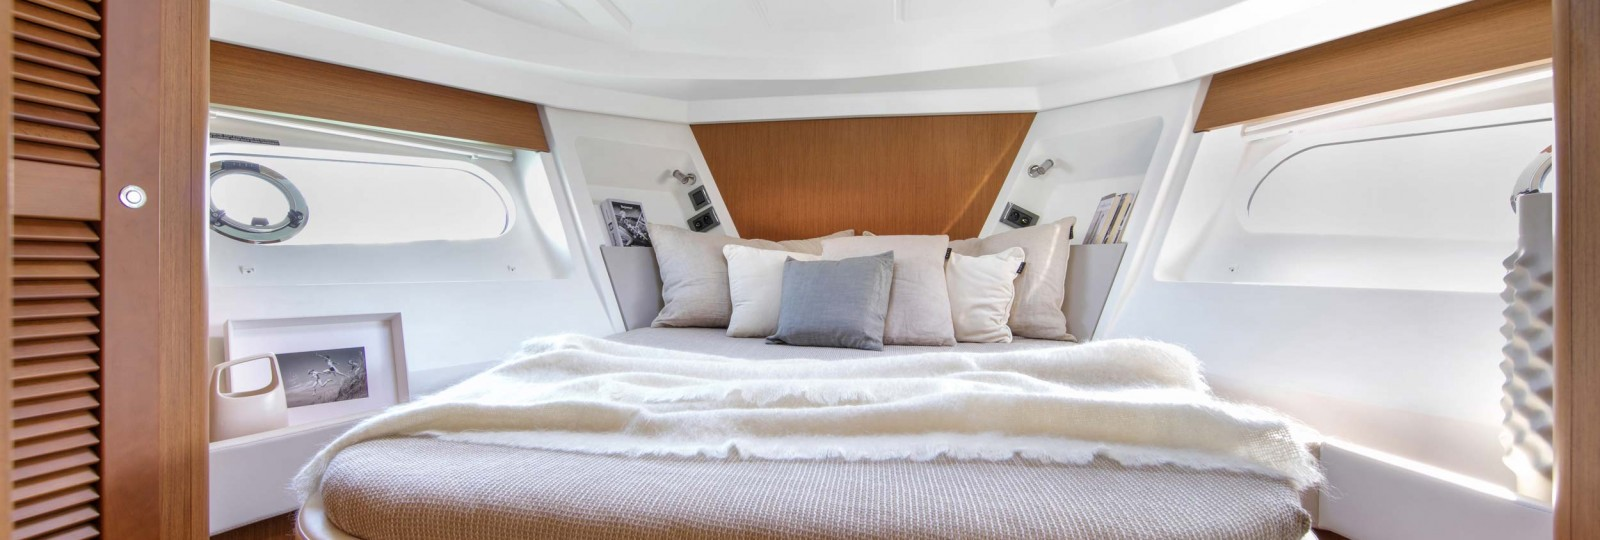 Beneteau Swift Trawler 35 master cabin